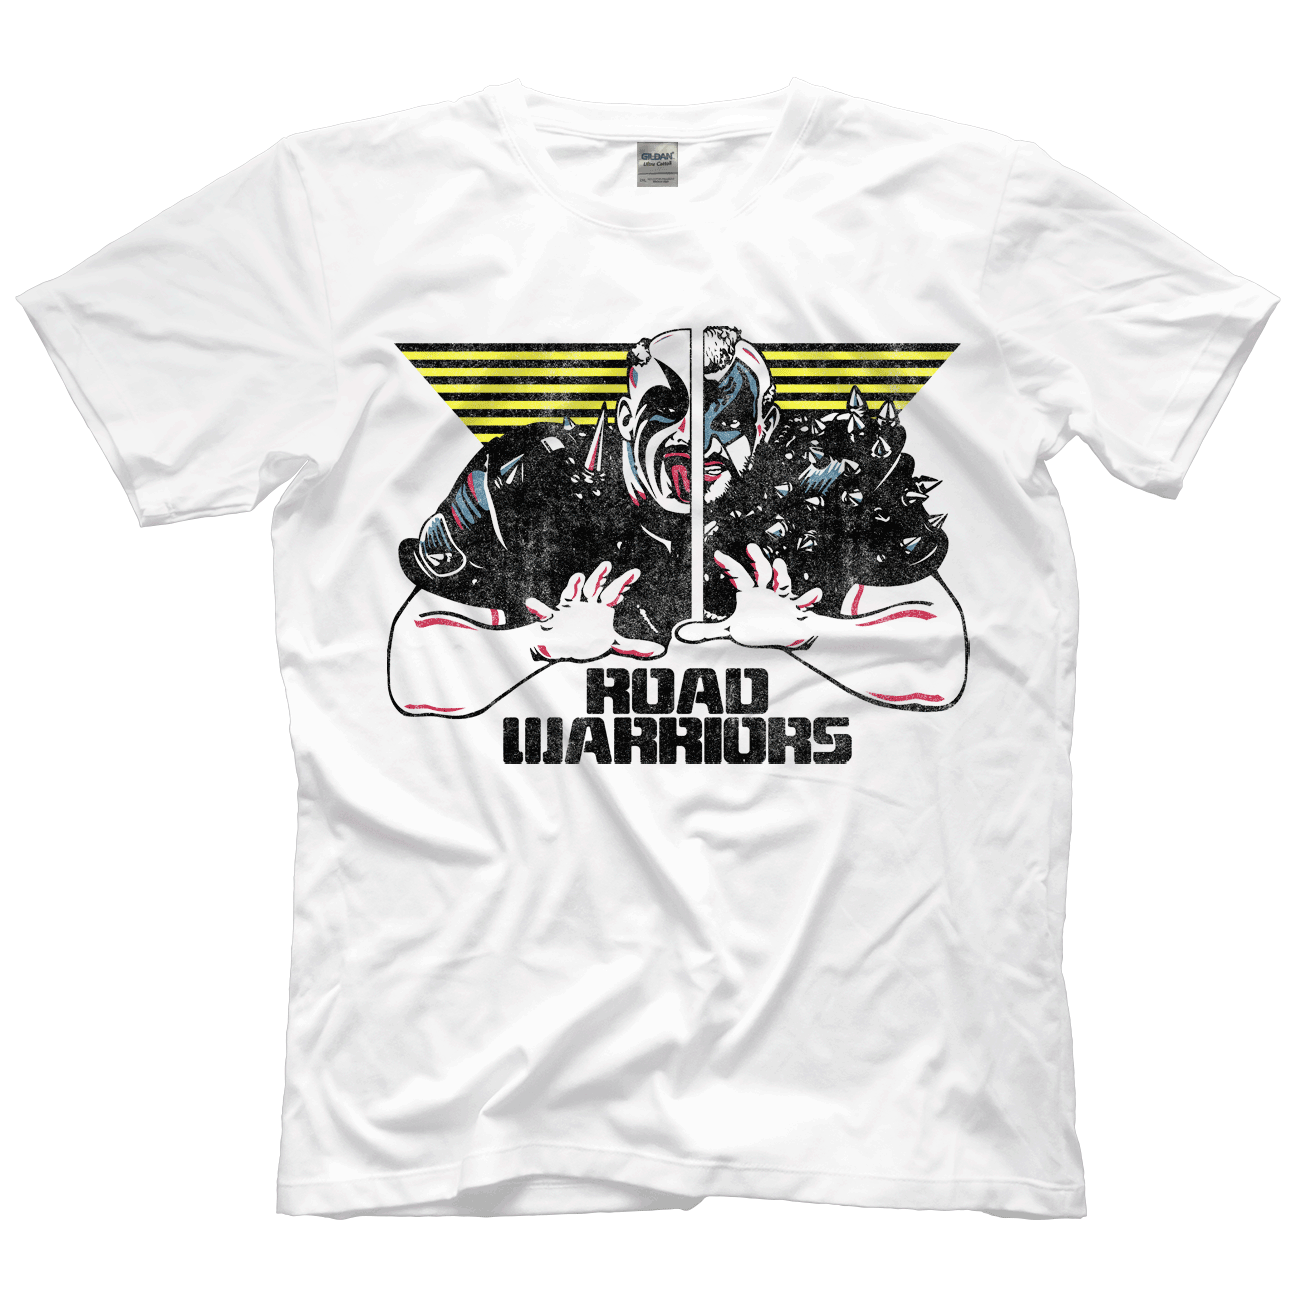 The Road Warriors T shirt; Road Warriors 1987 Champions Tee shirt